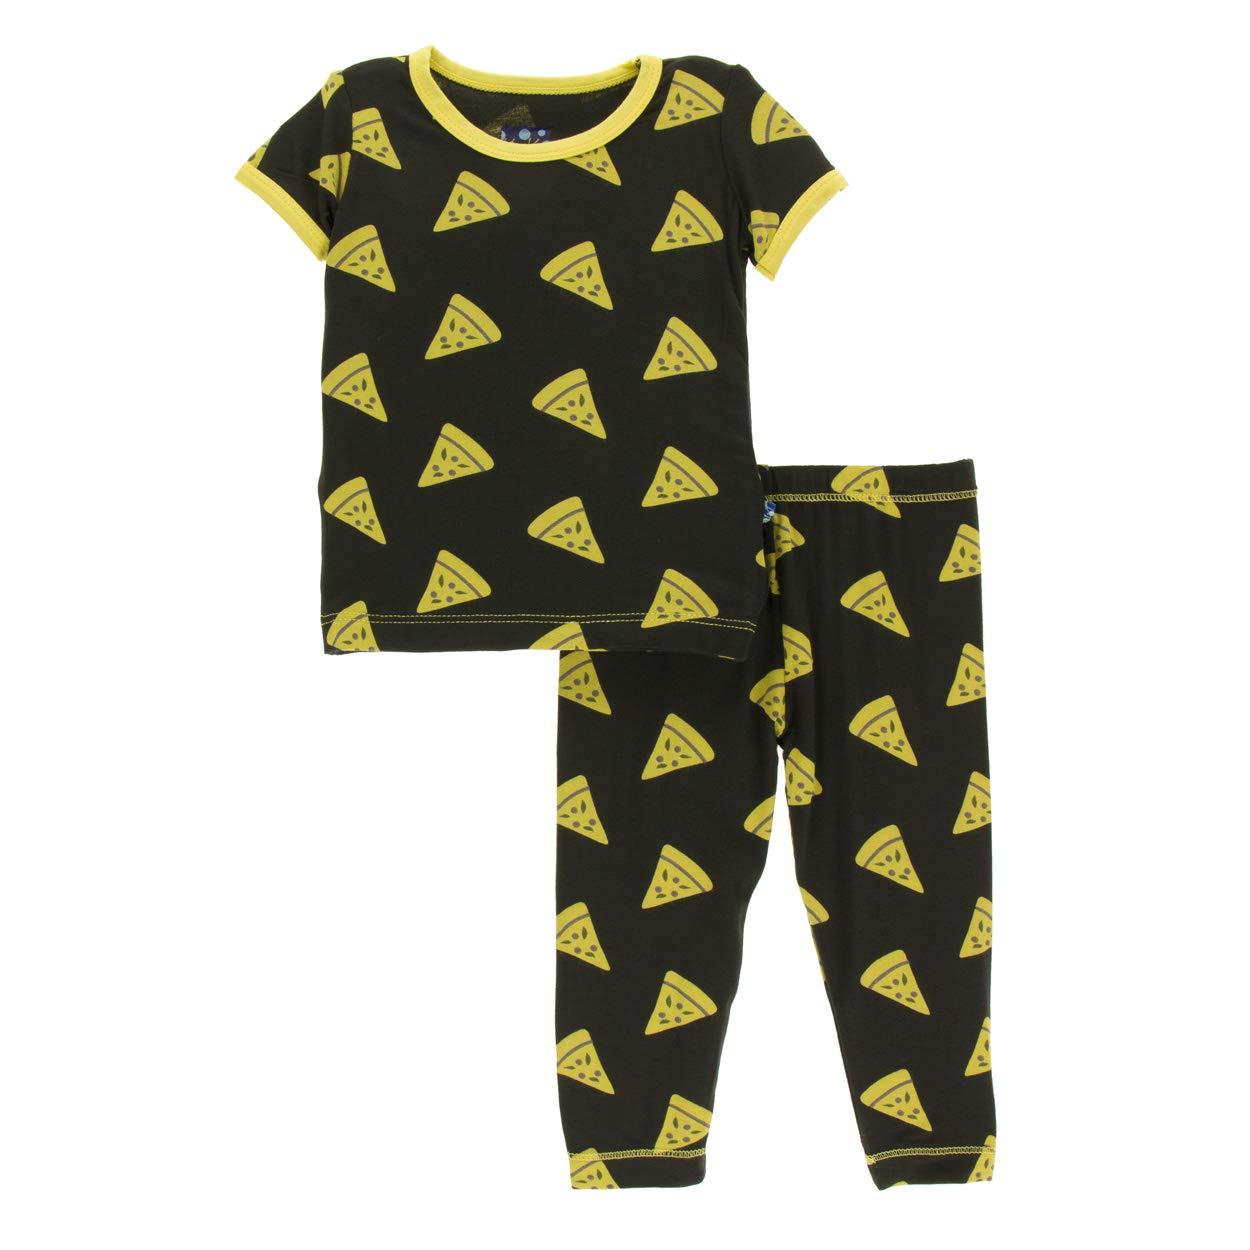 Kickee Pants Little Girls and Boys Print Short Sleeve Pajama Set - Zebra Pizza, 3T by Kickee Pants